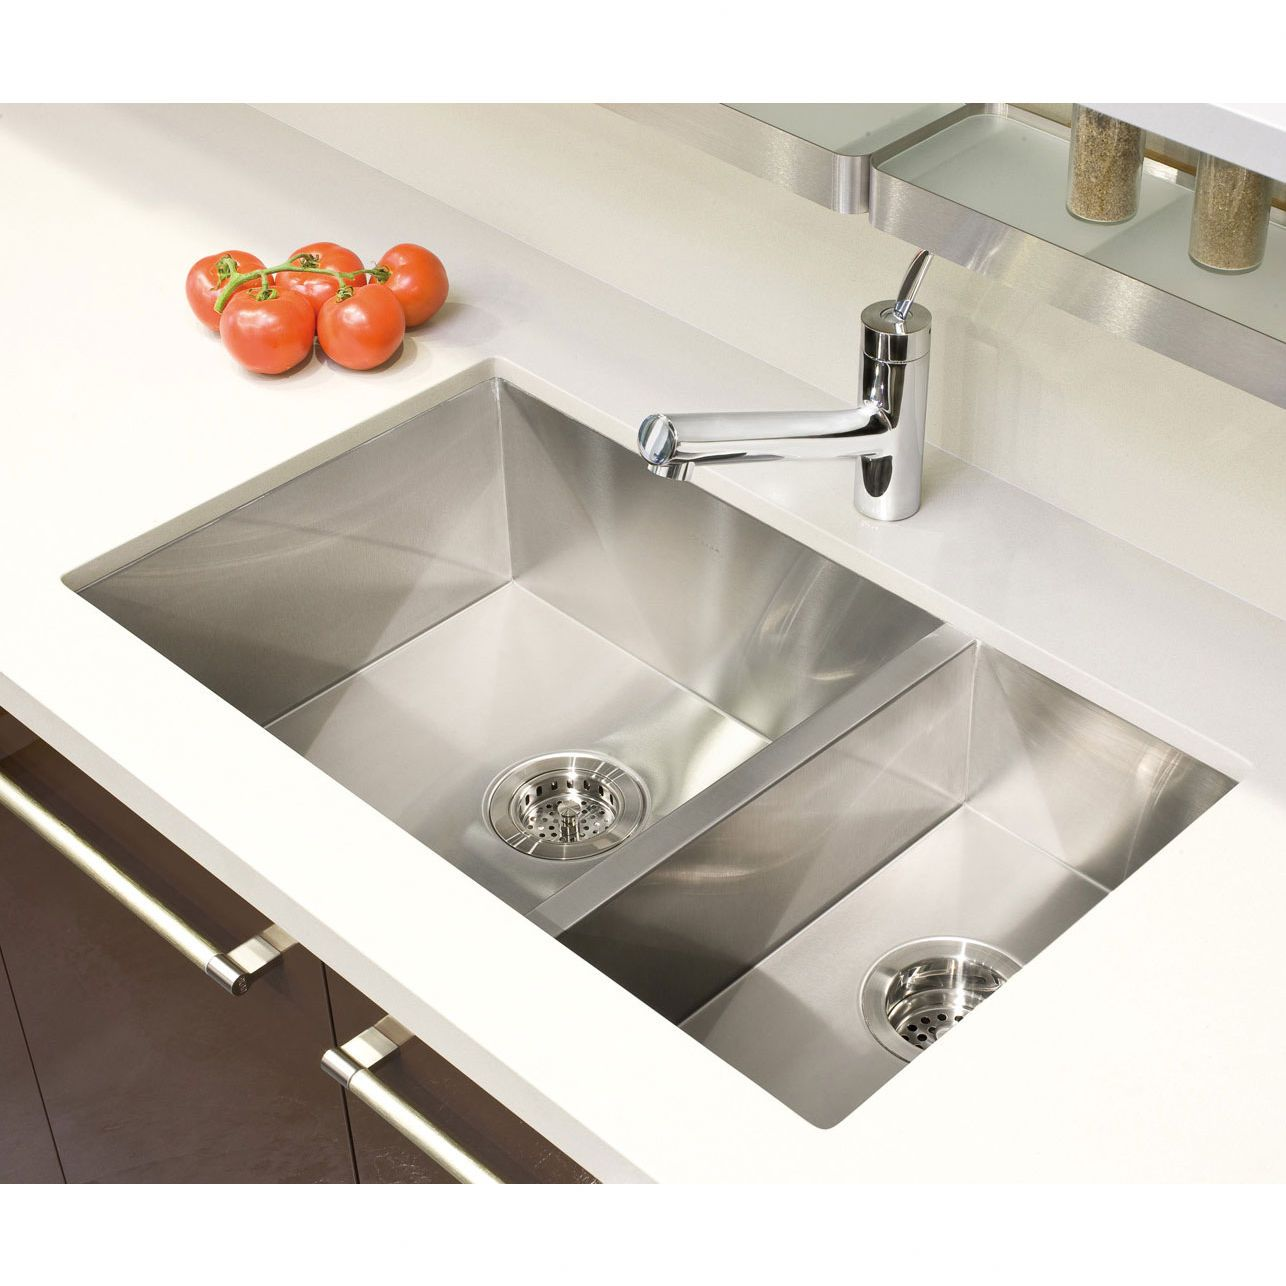 Julien Urbanedge 7 75 X 14 75 Undermount Stainless Steel Double Contemporary Kitchen Sinks Double Bowl Kitchen Sink Stainless Steel Double Bowl Kitchen Sink